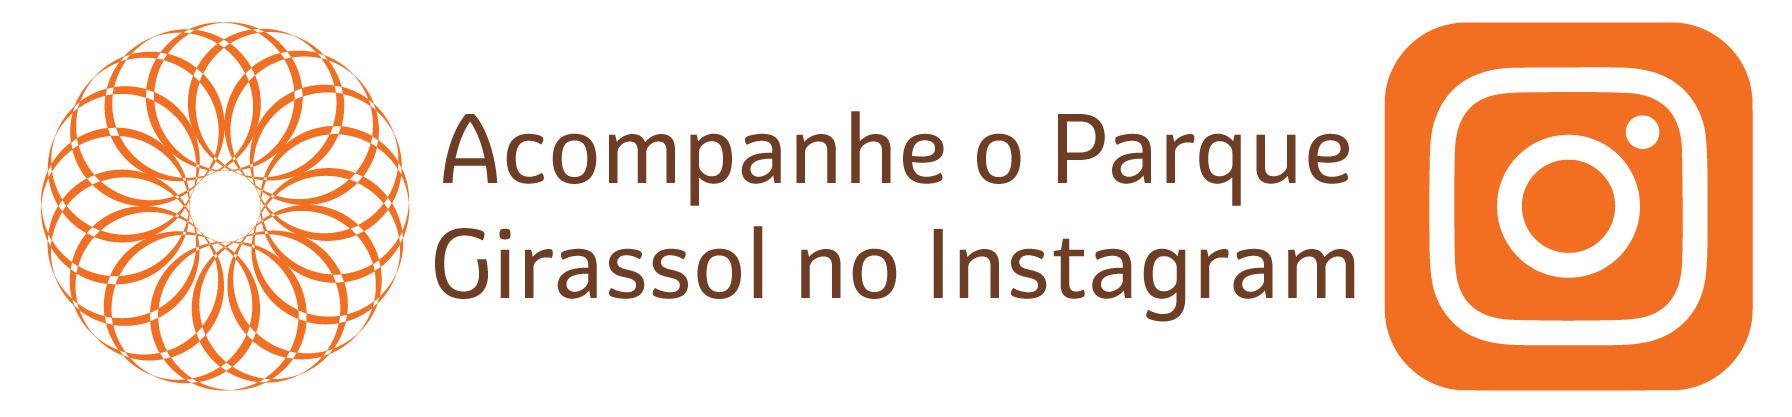 parque girassol 1-01